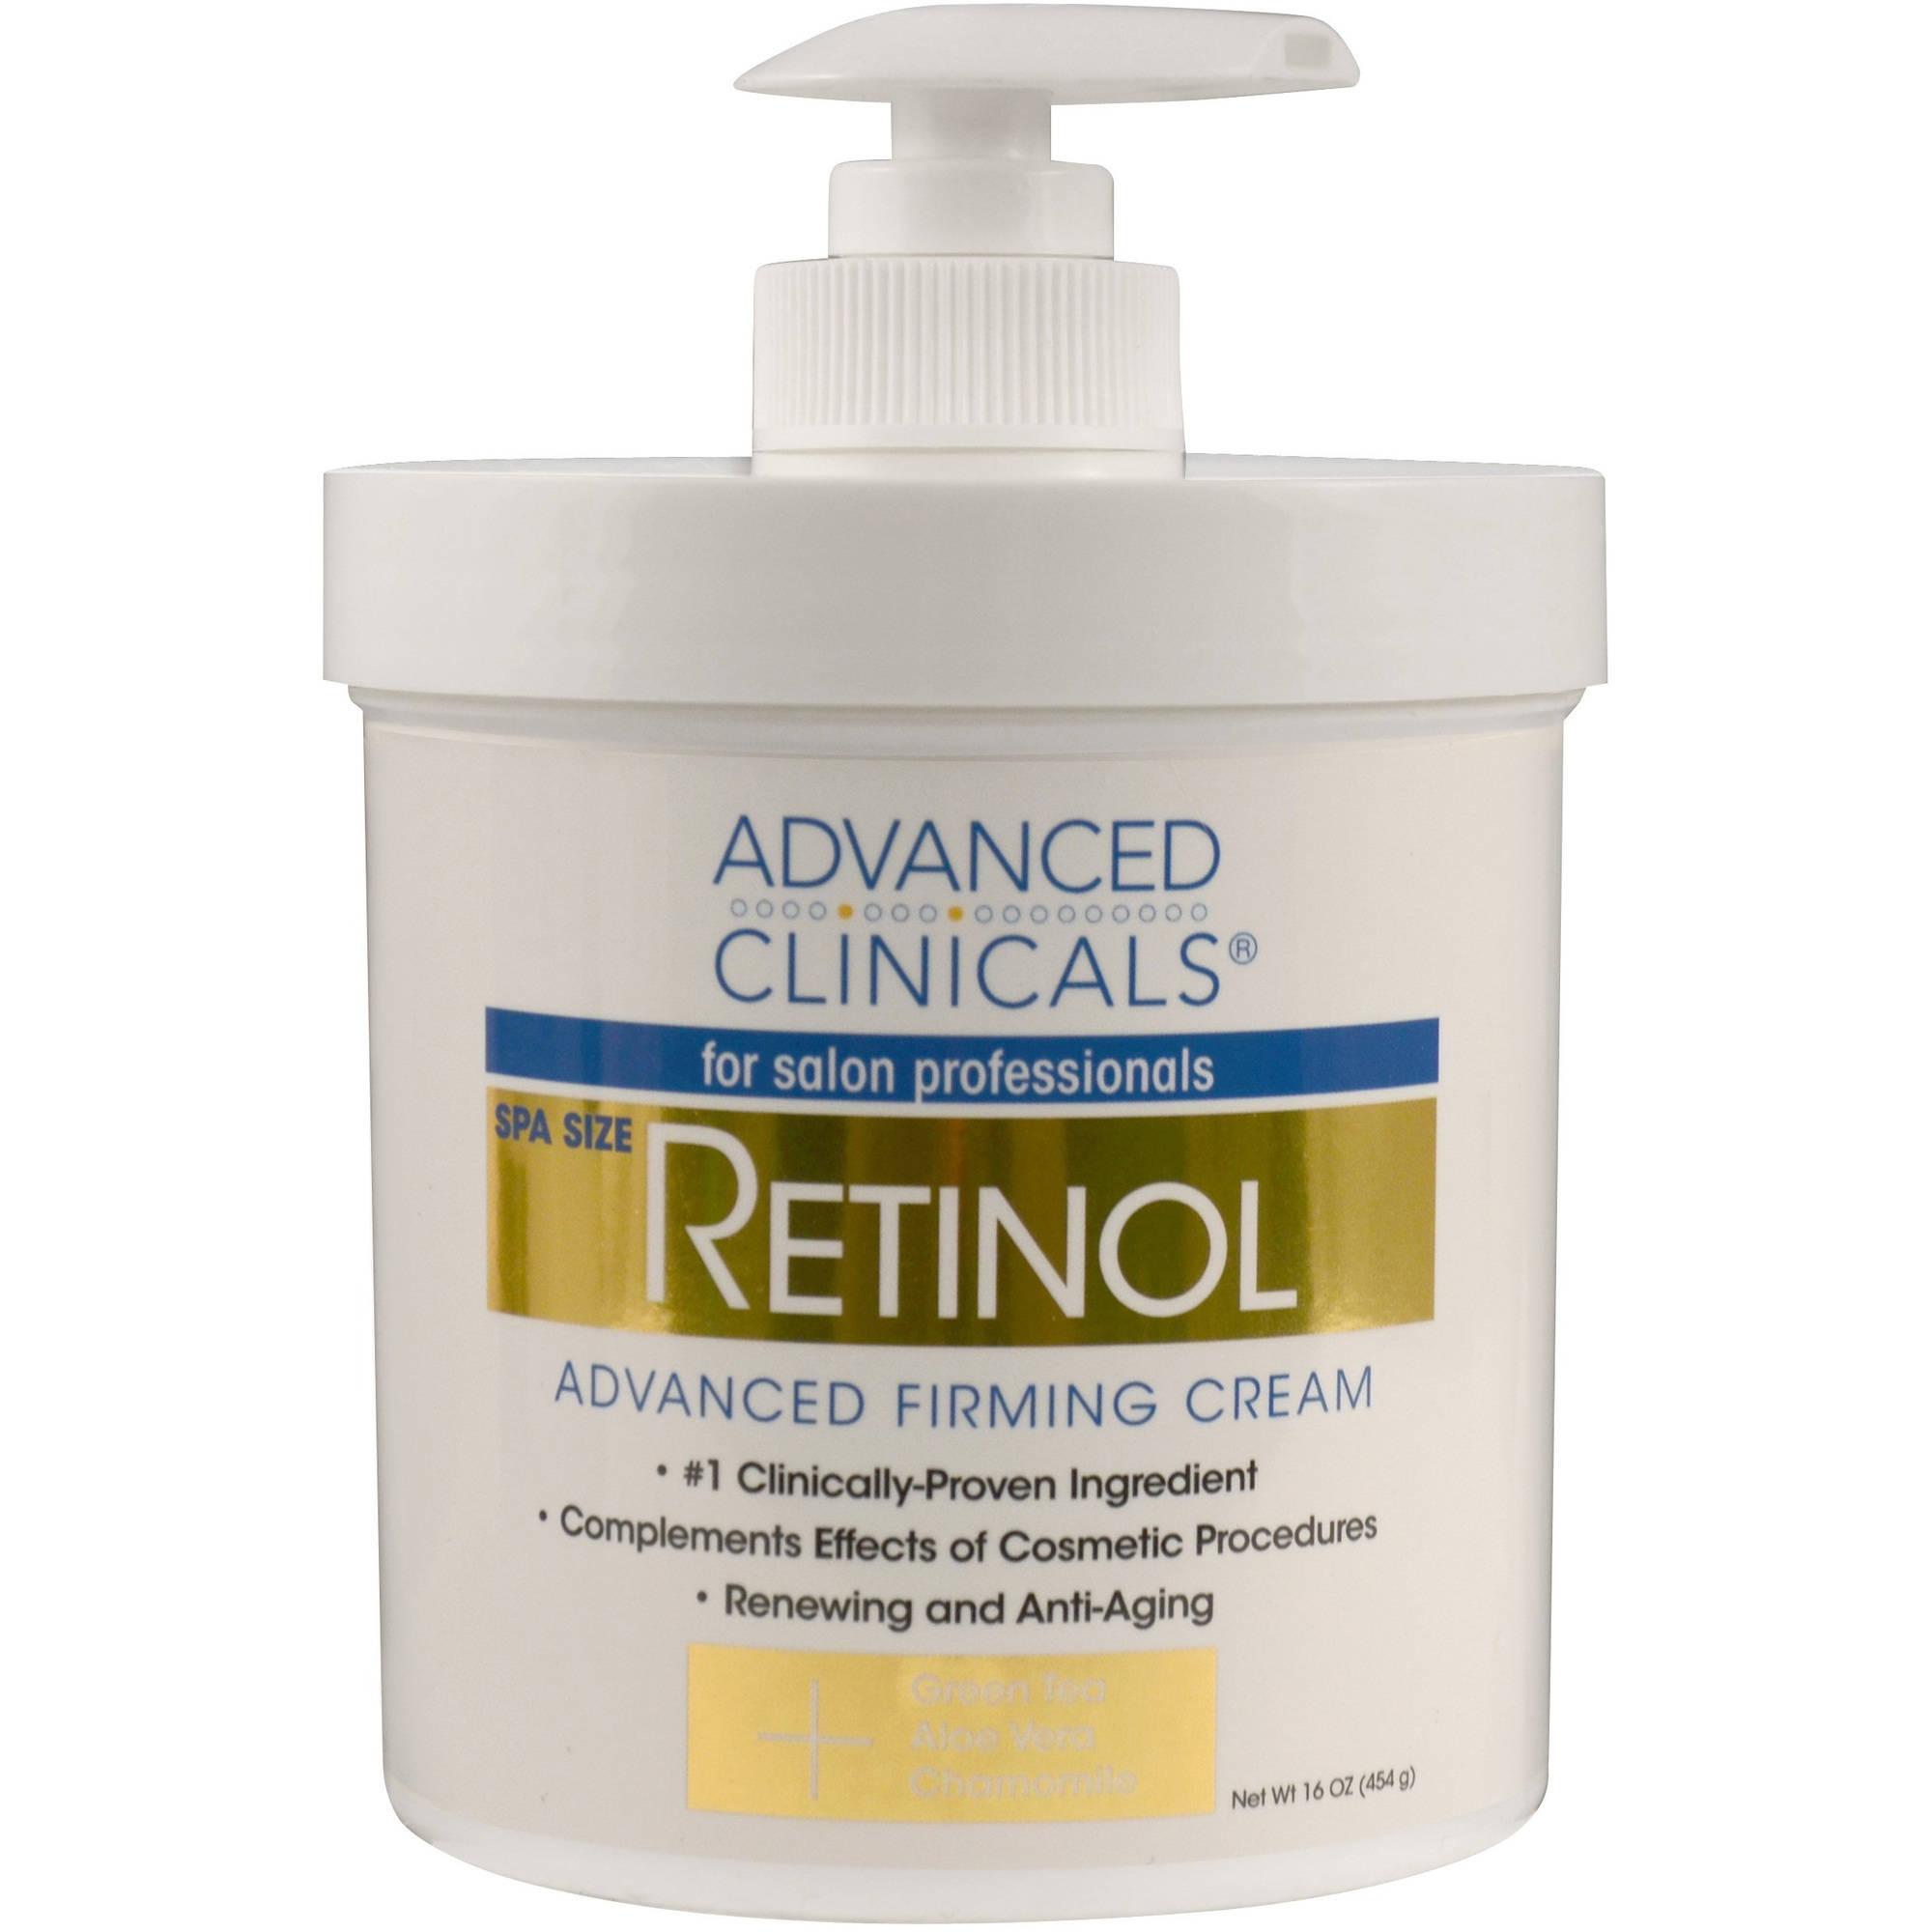 Image of Advanced Clinicals Retinol Firming Cream, 16 Oz